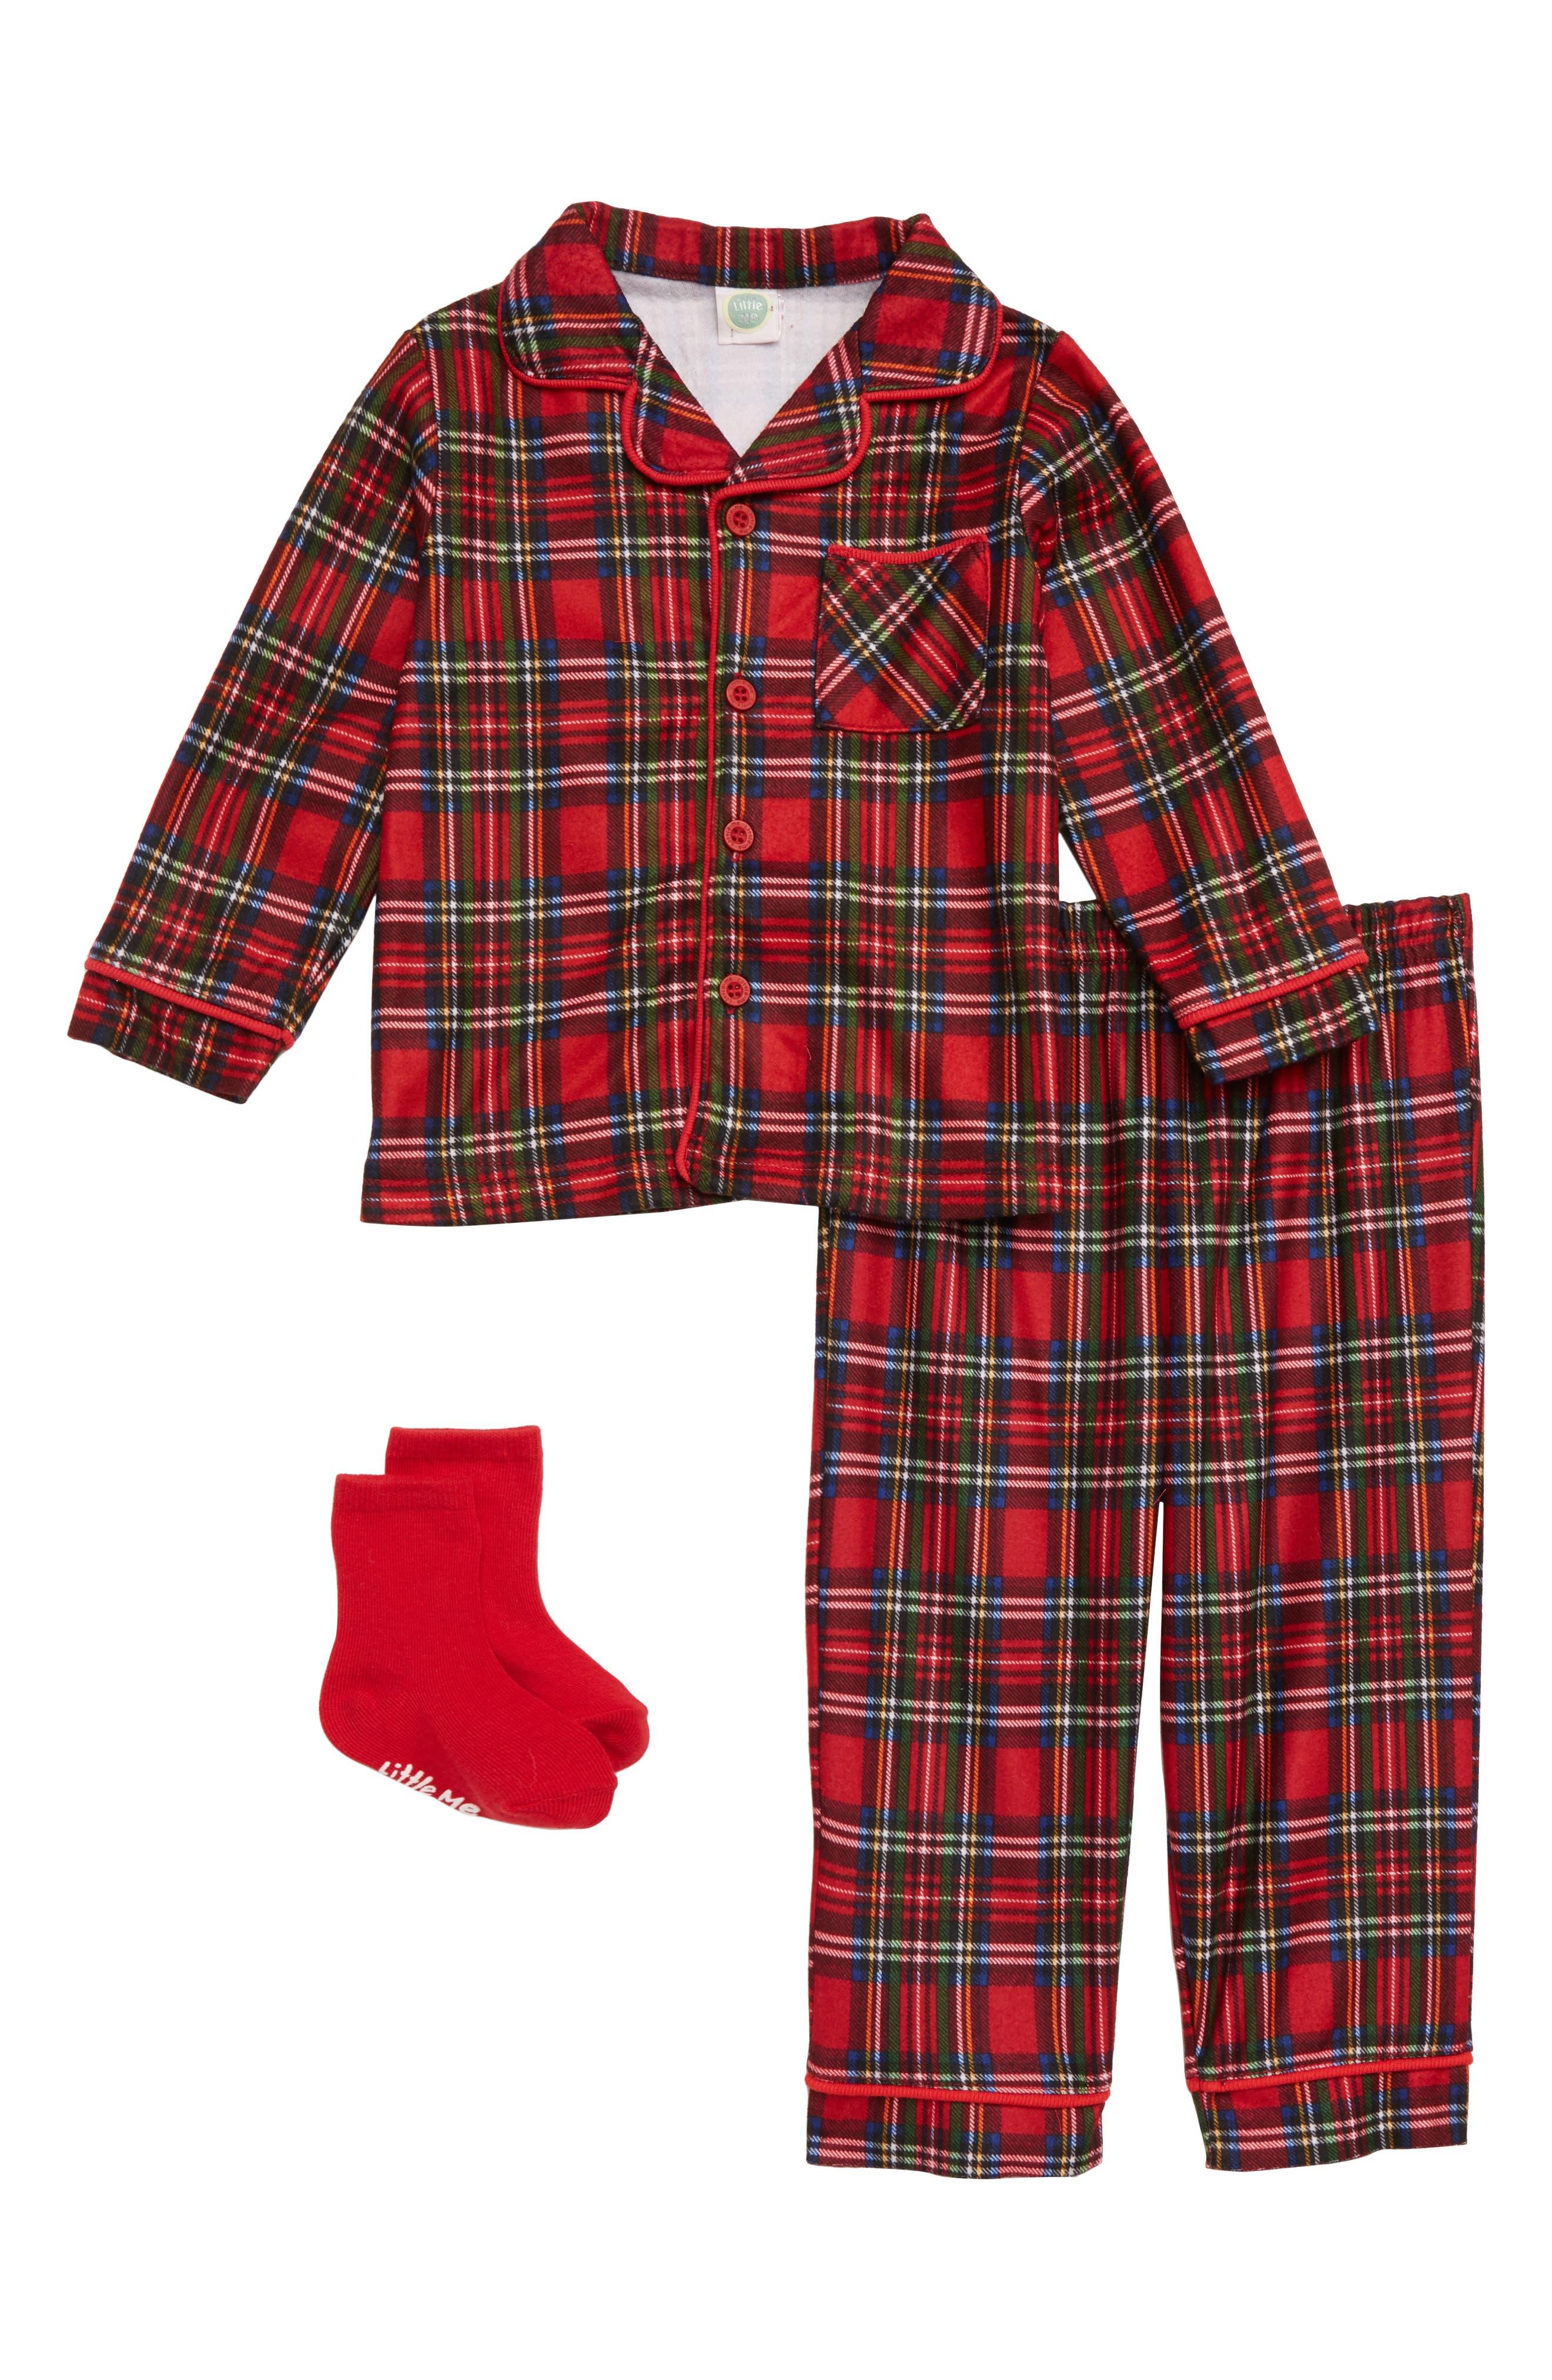 Christmas Plaid Two-Piece Pajamas & Socks Set,                             Main thumbnail 1, color,                             RED PLAID